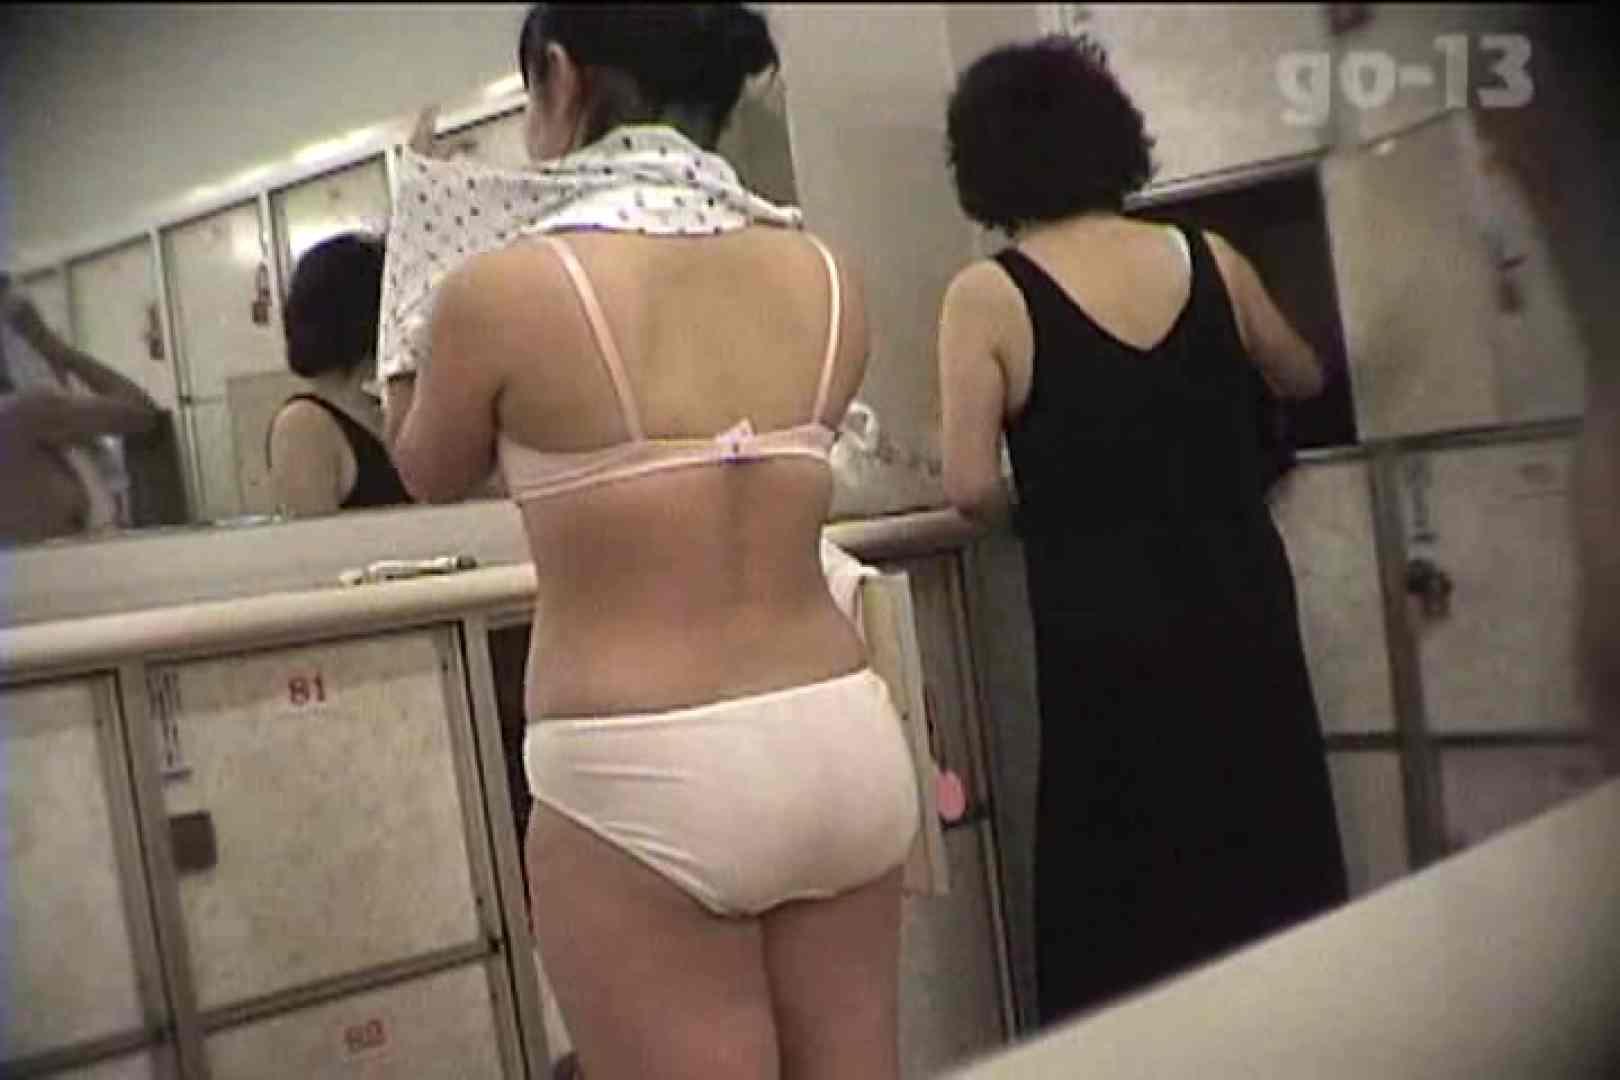 厳選潜入女風呂 No.13 潜入 ヌード画像 94連発 23